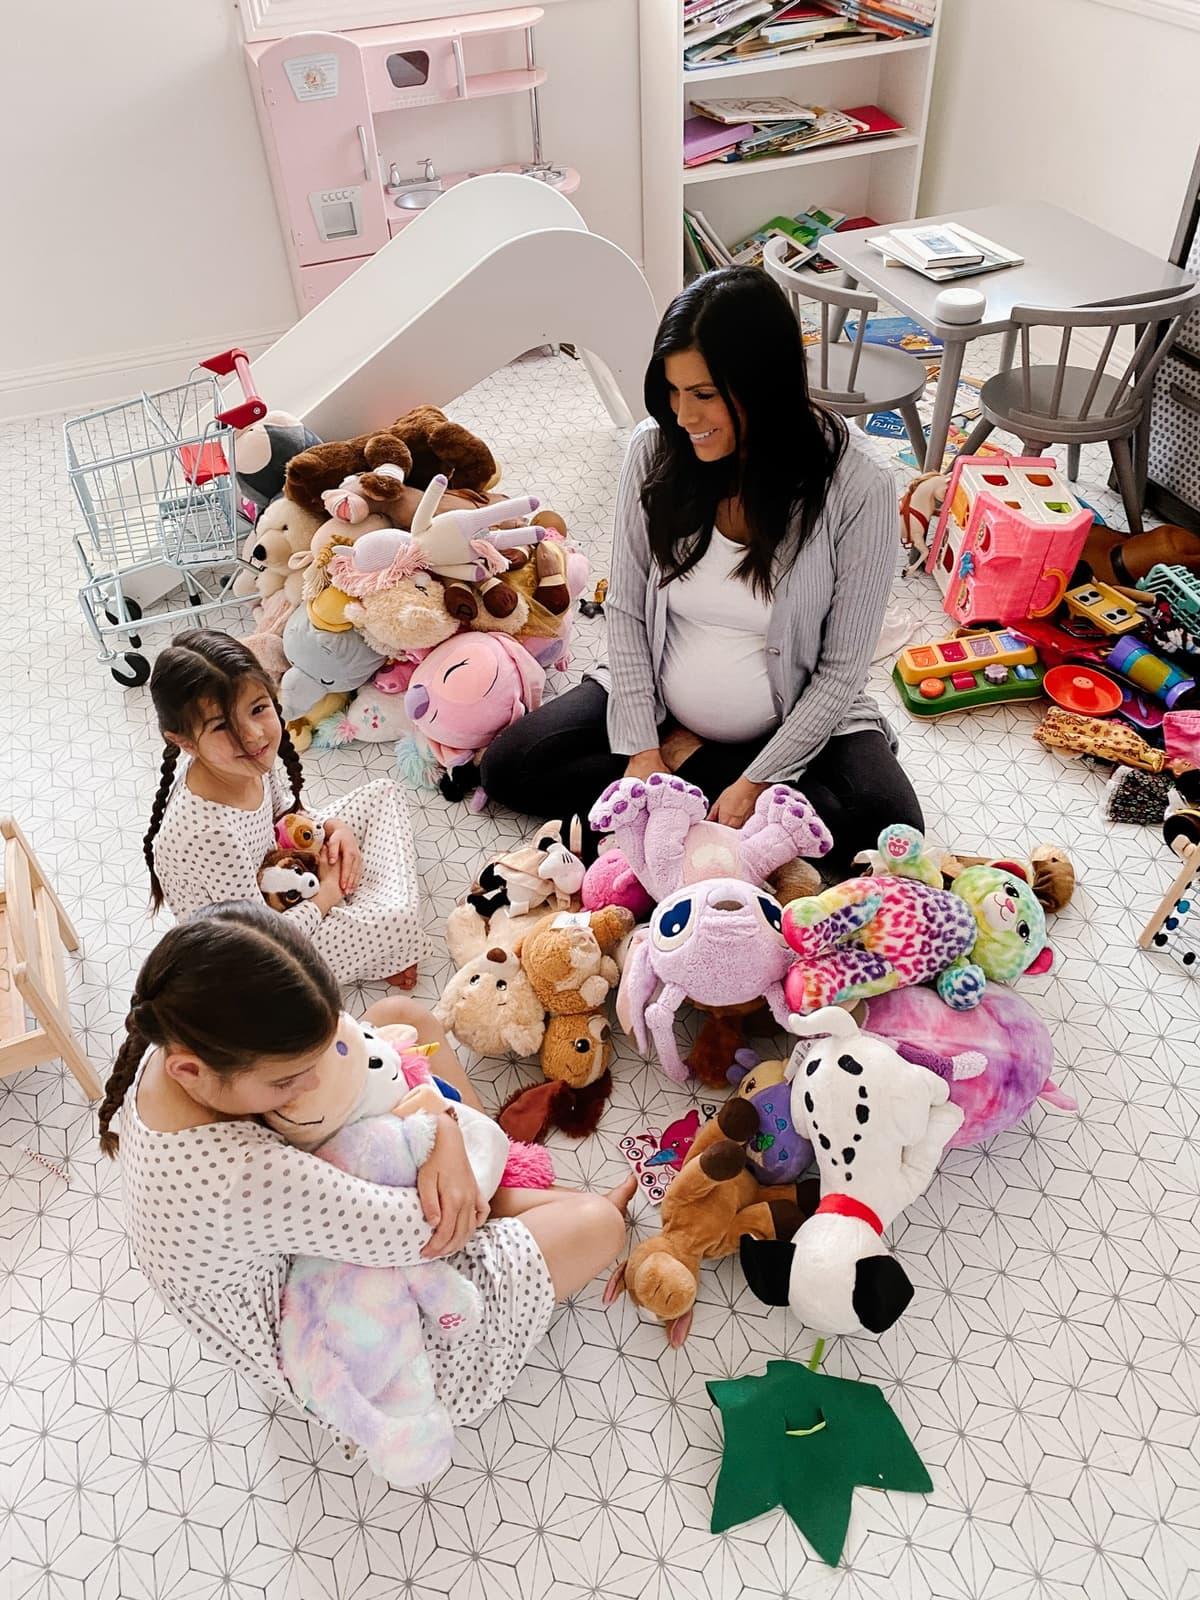 kids stuffed animals